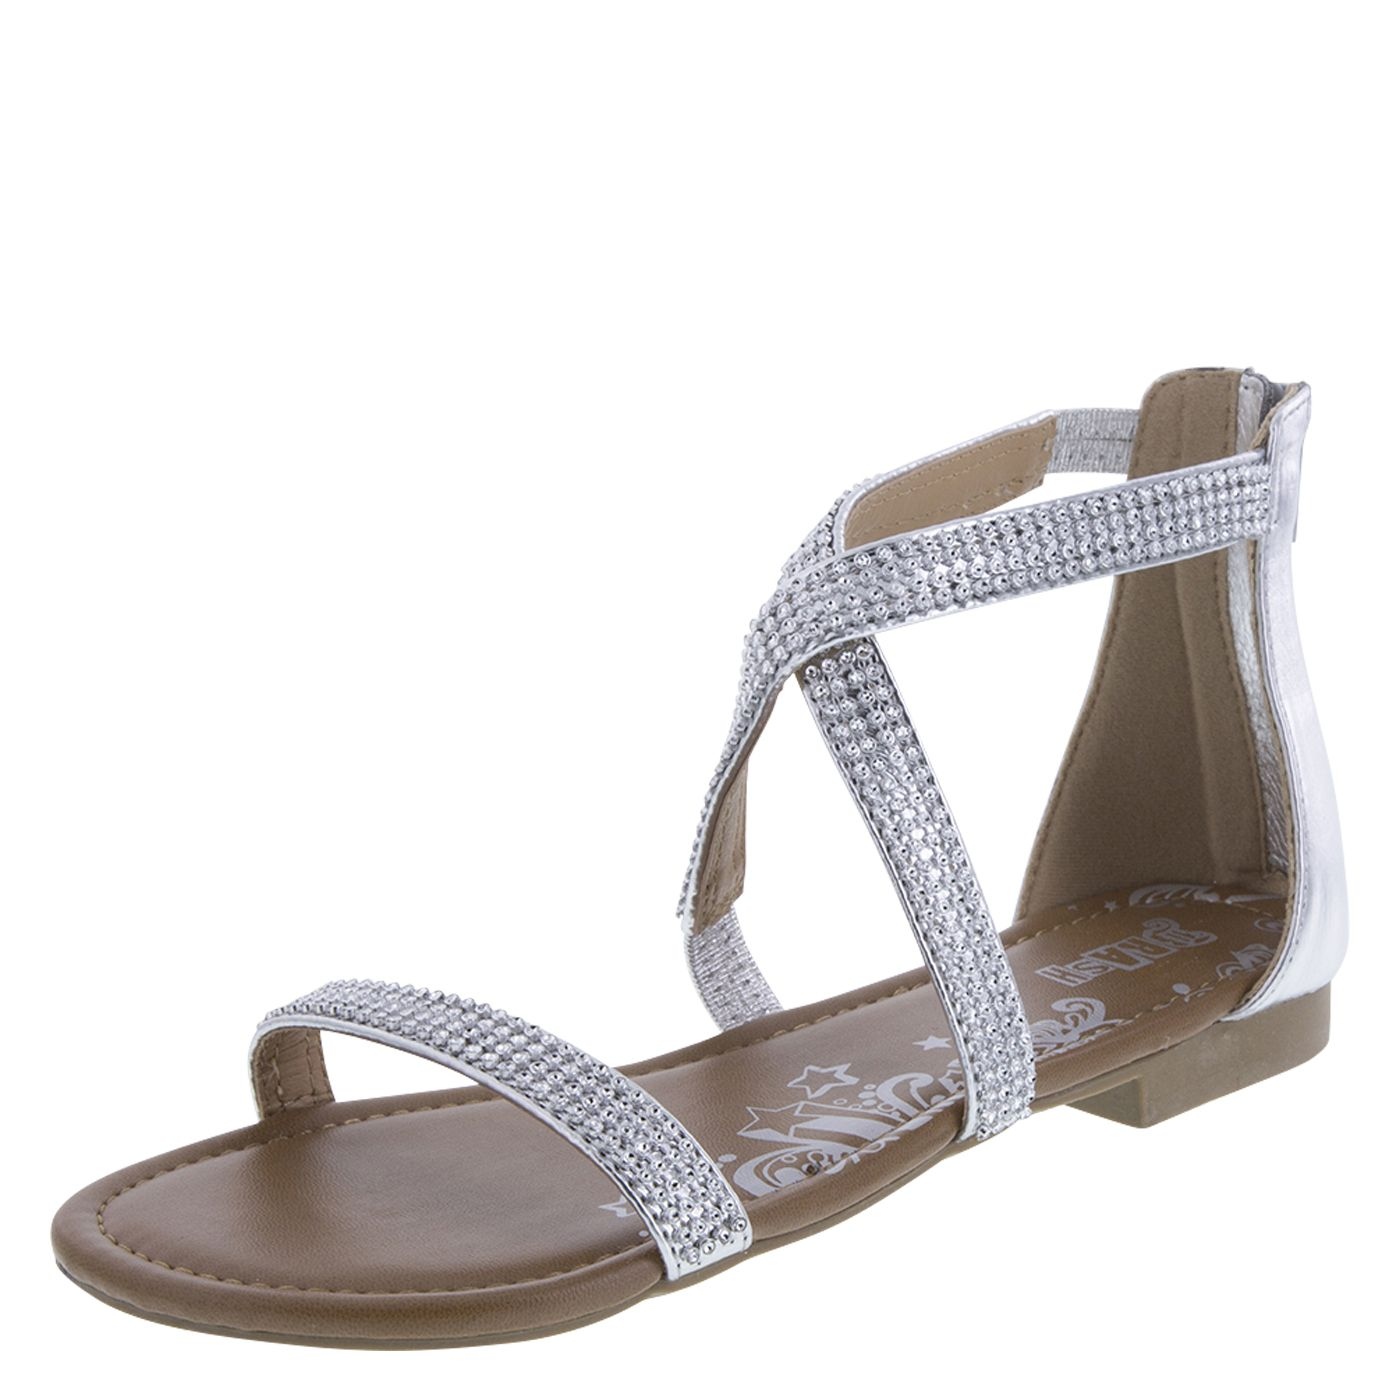 Womens sandals at payless - Women S Reign Jewel Flat Sandalwomen S Reign Jewel Flat Sandal